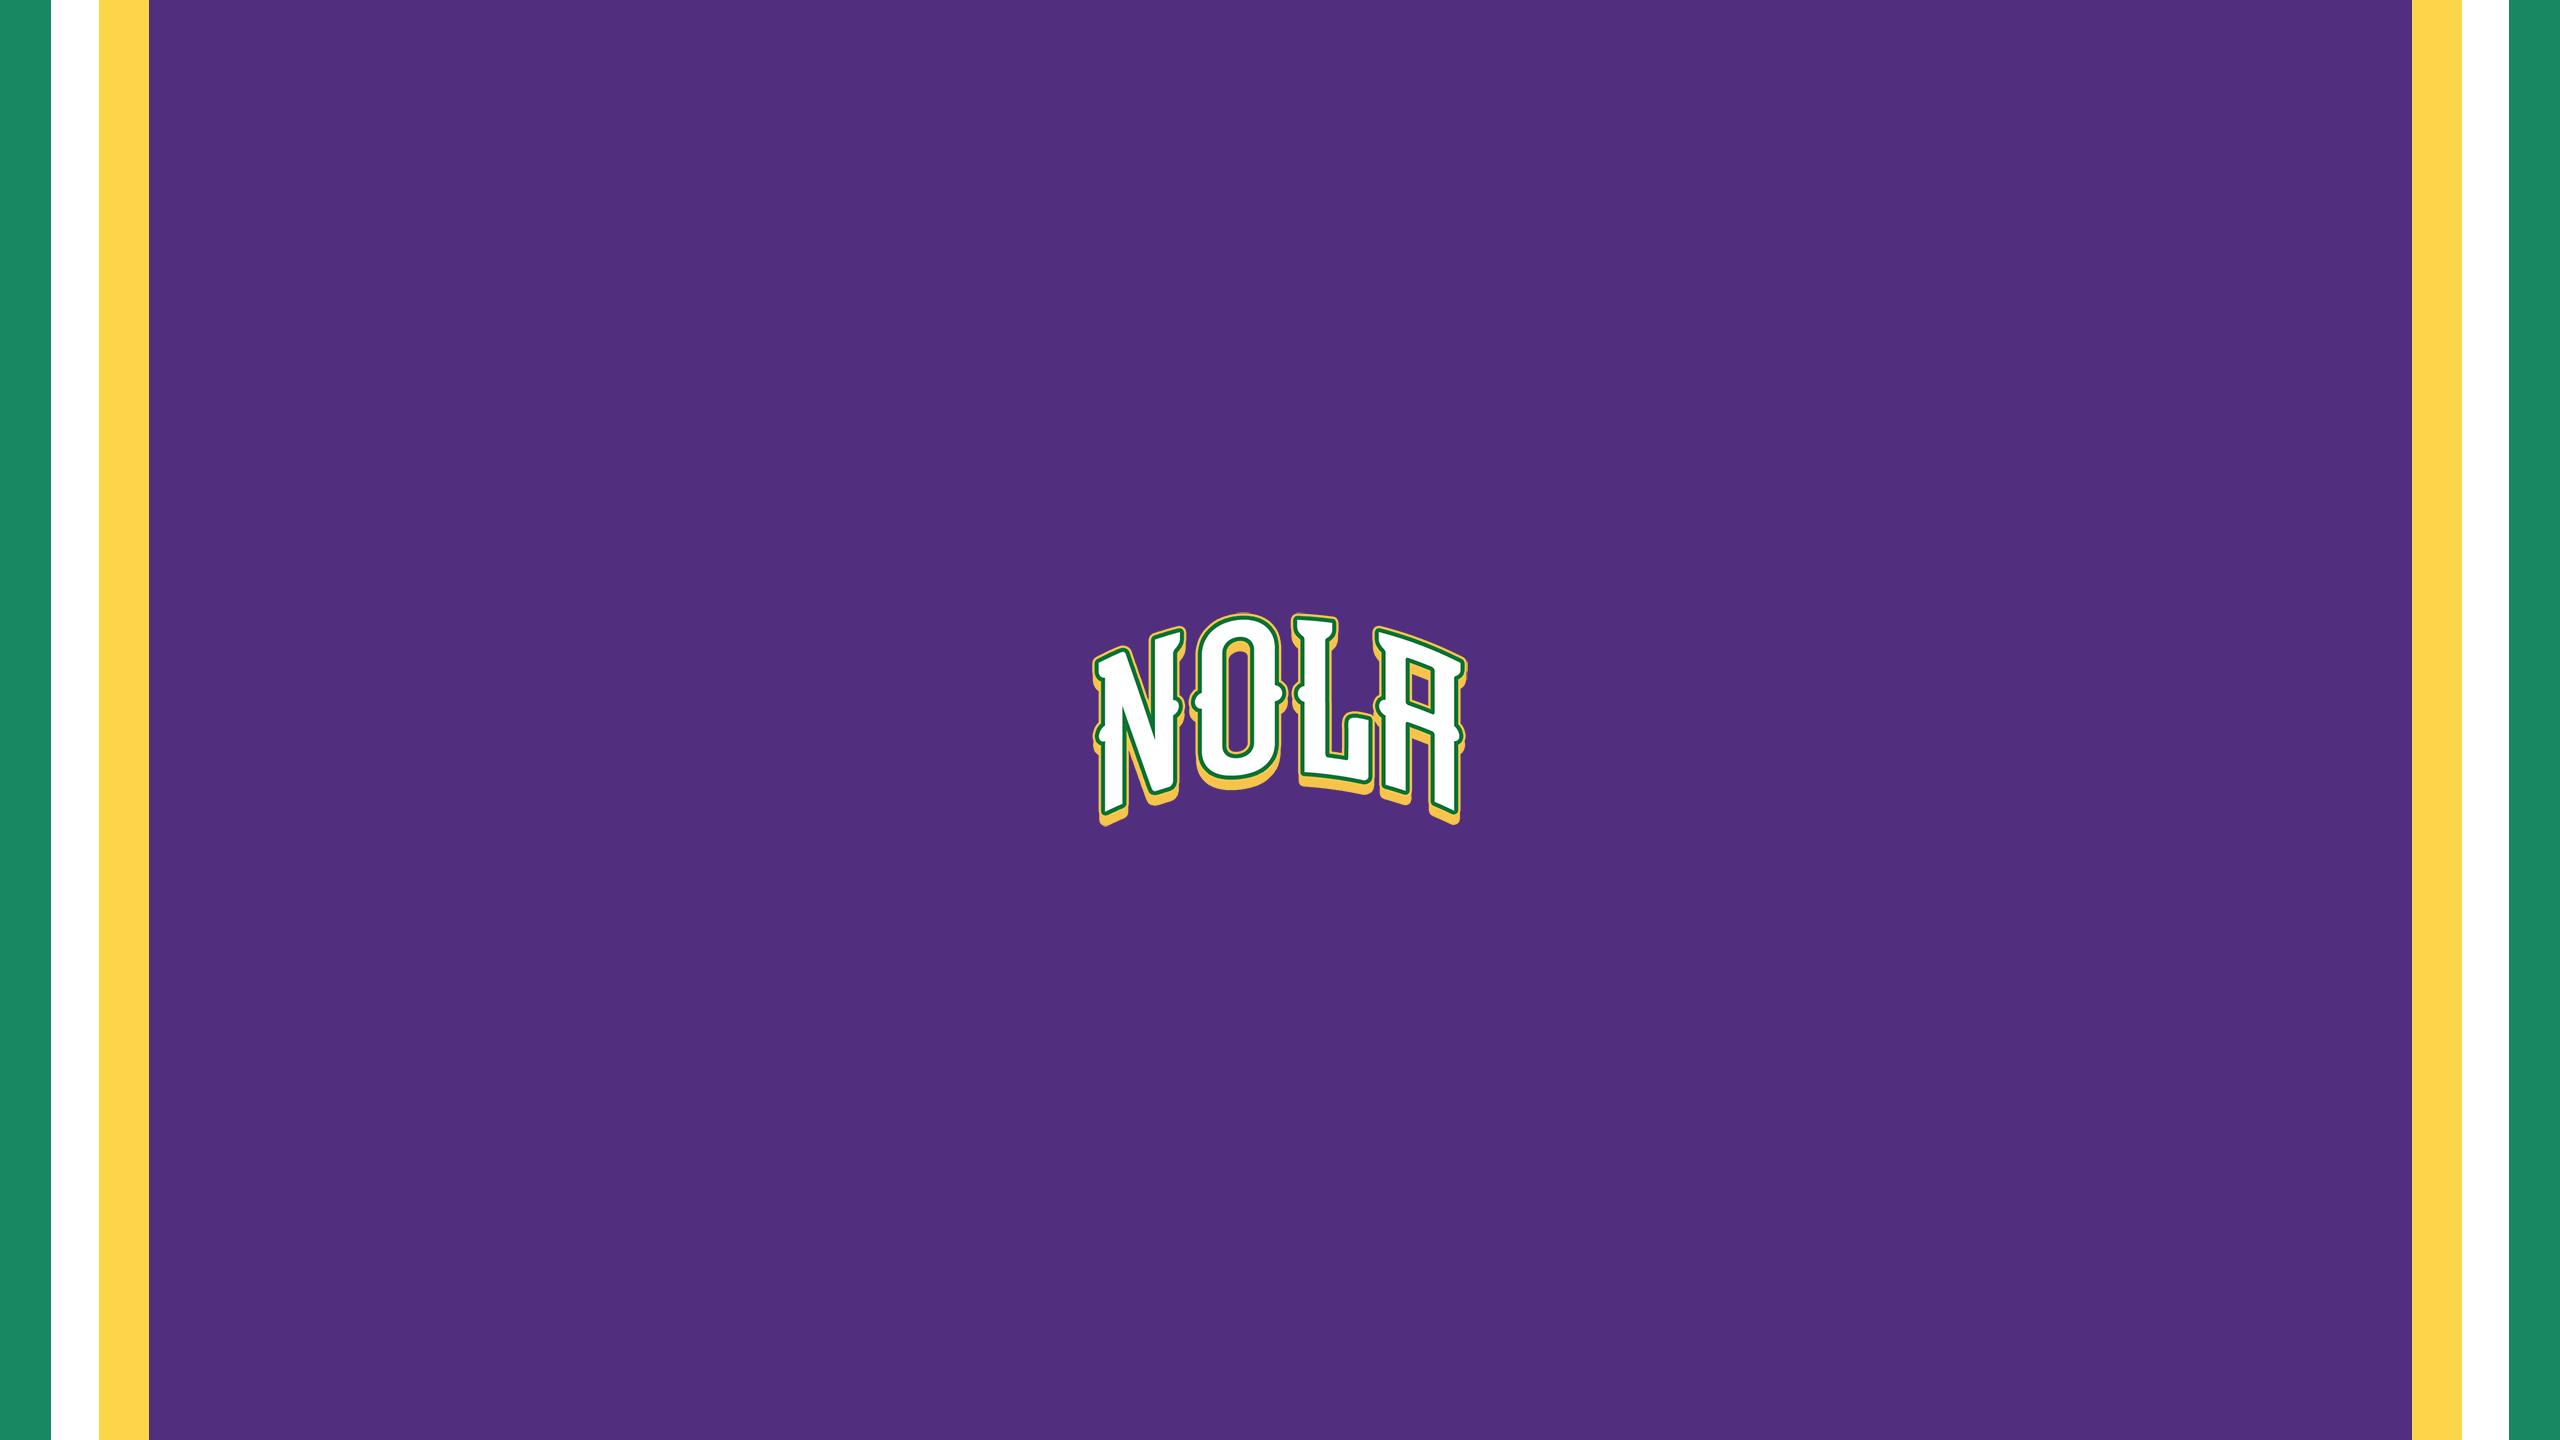 New Orleans Pelicans (2017)